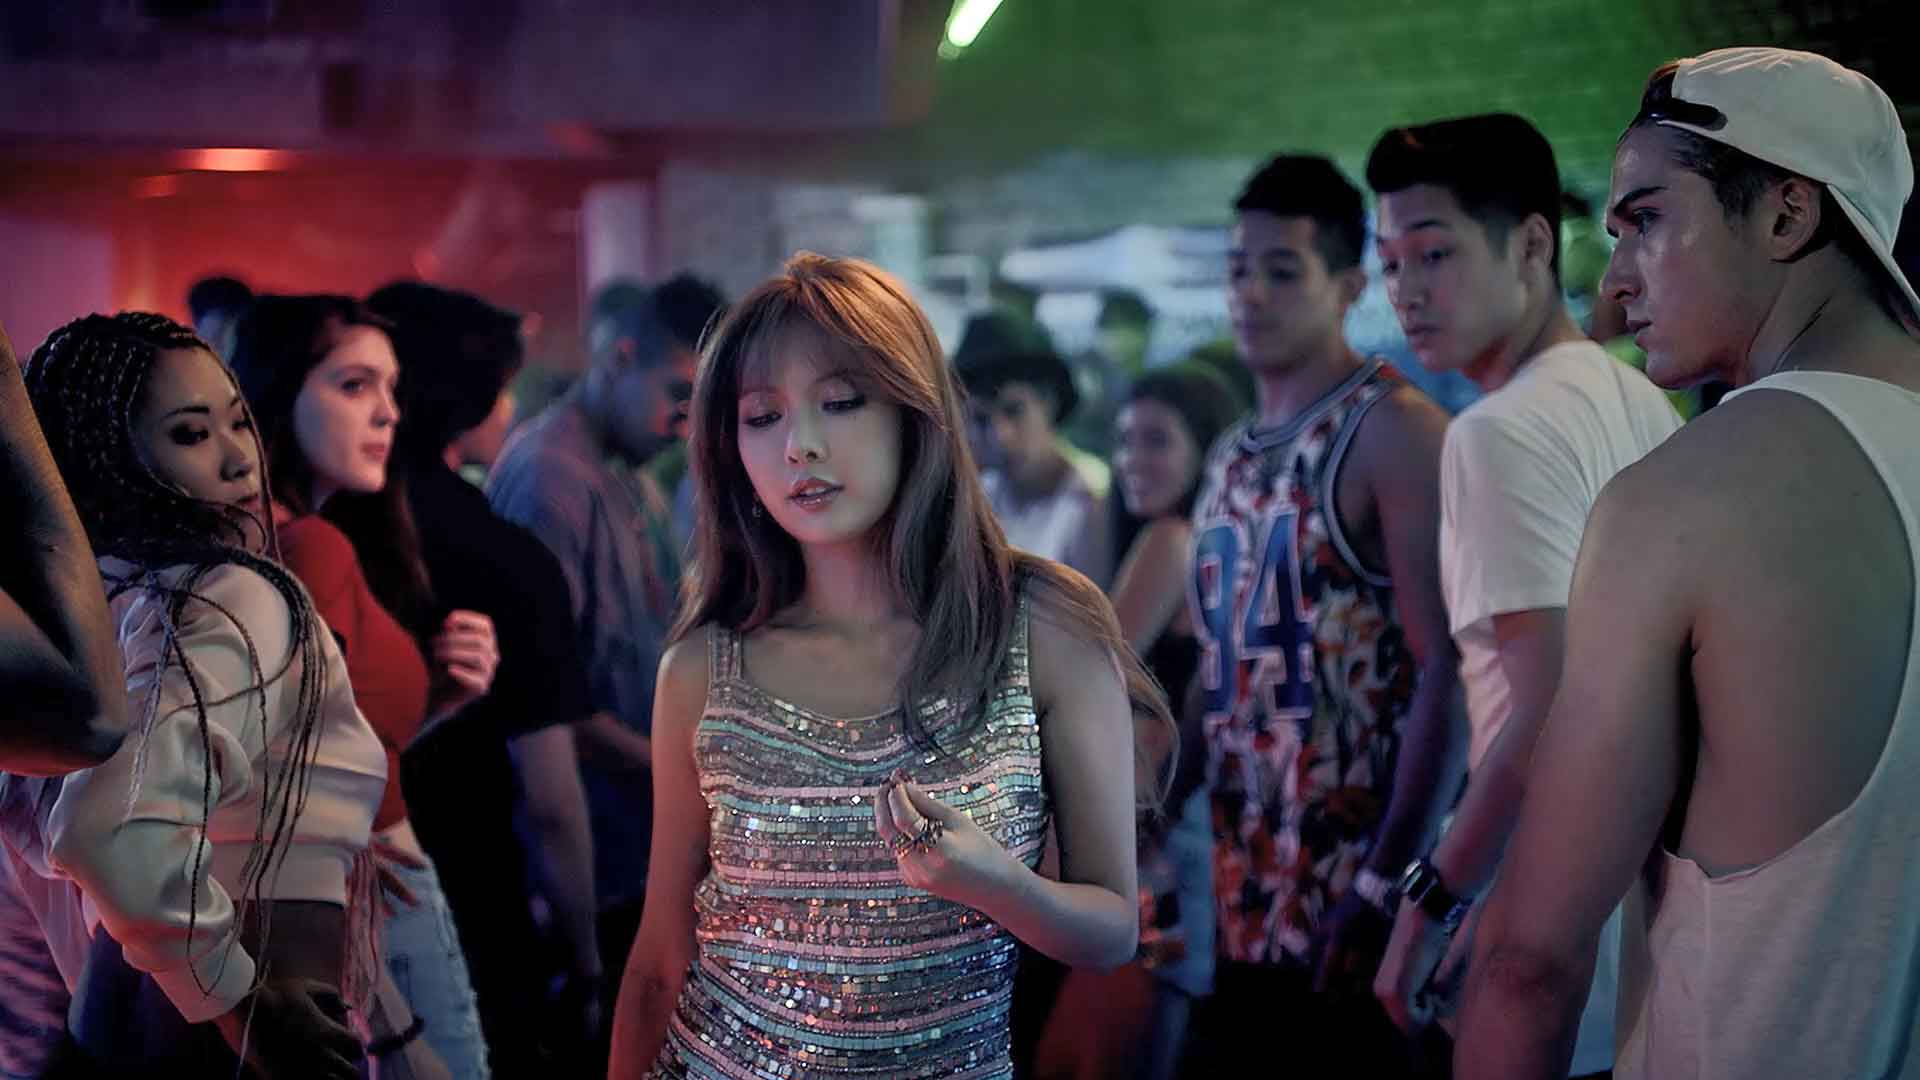 [1080P] Hyuna金泫雅 - How's this(Bugs - 538m)